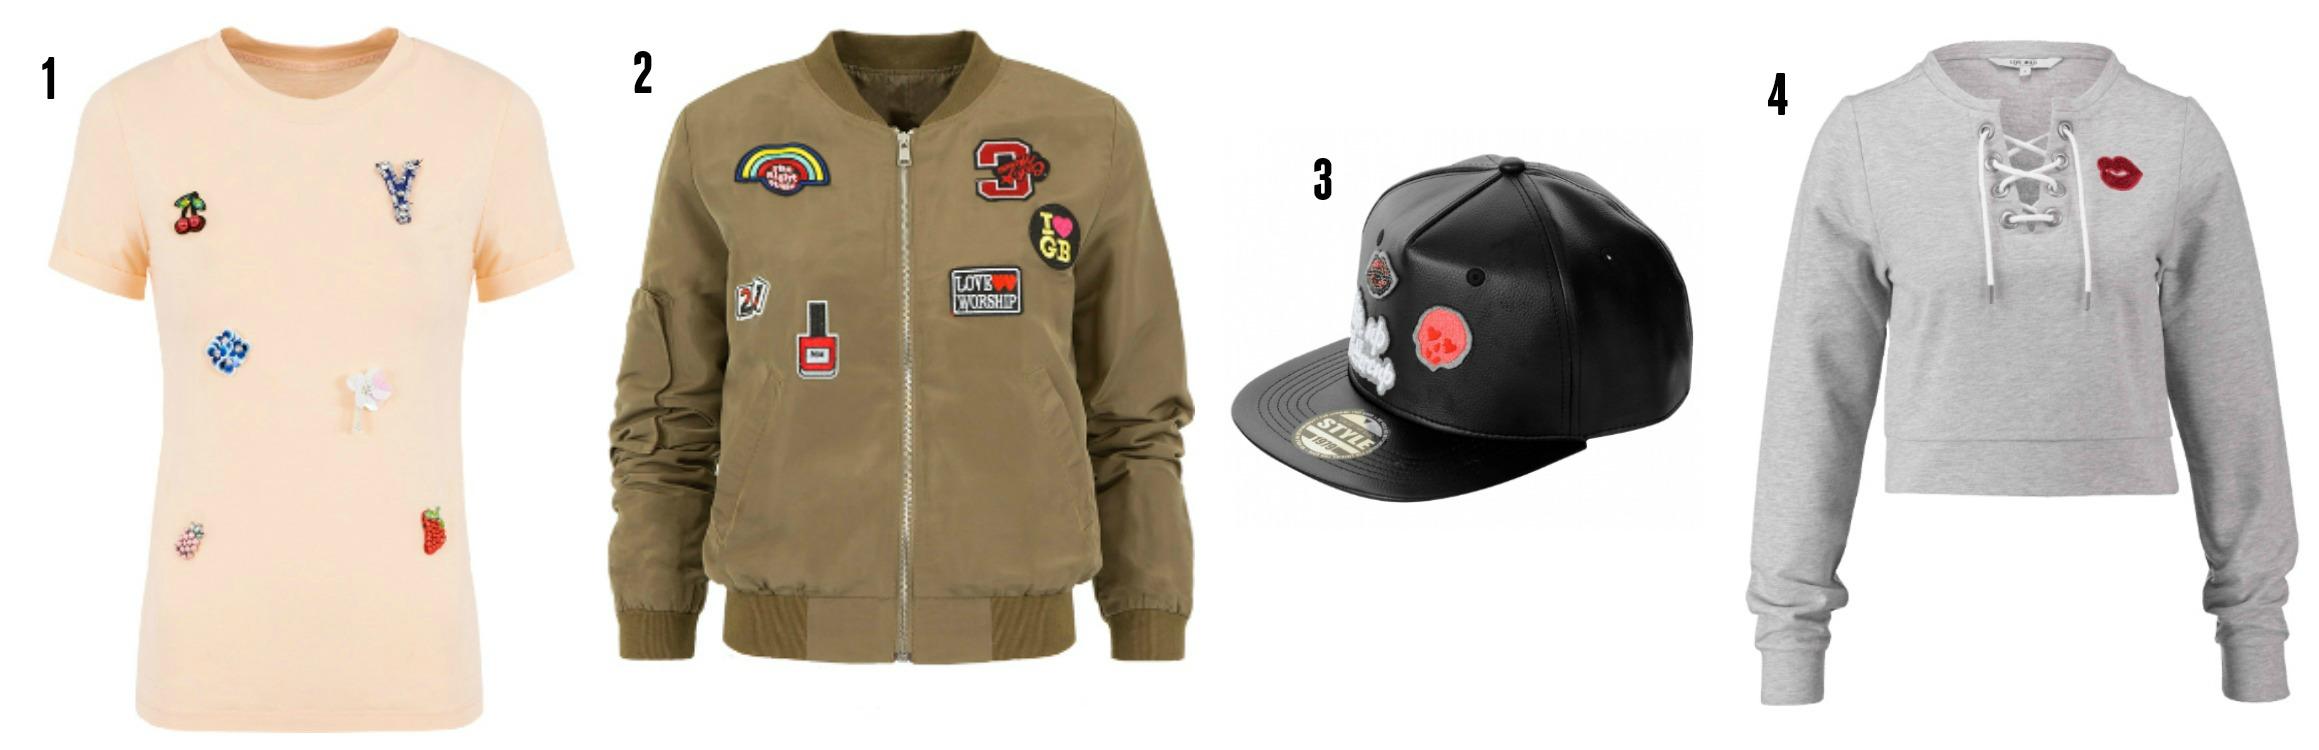 patches-op-kleding-trend-tshirt-sweather-cap-bomber-jack.jpg